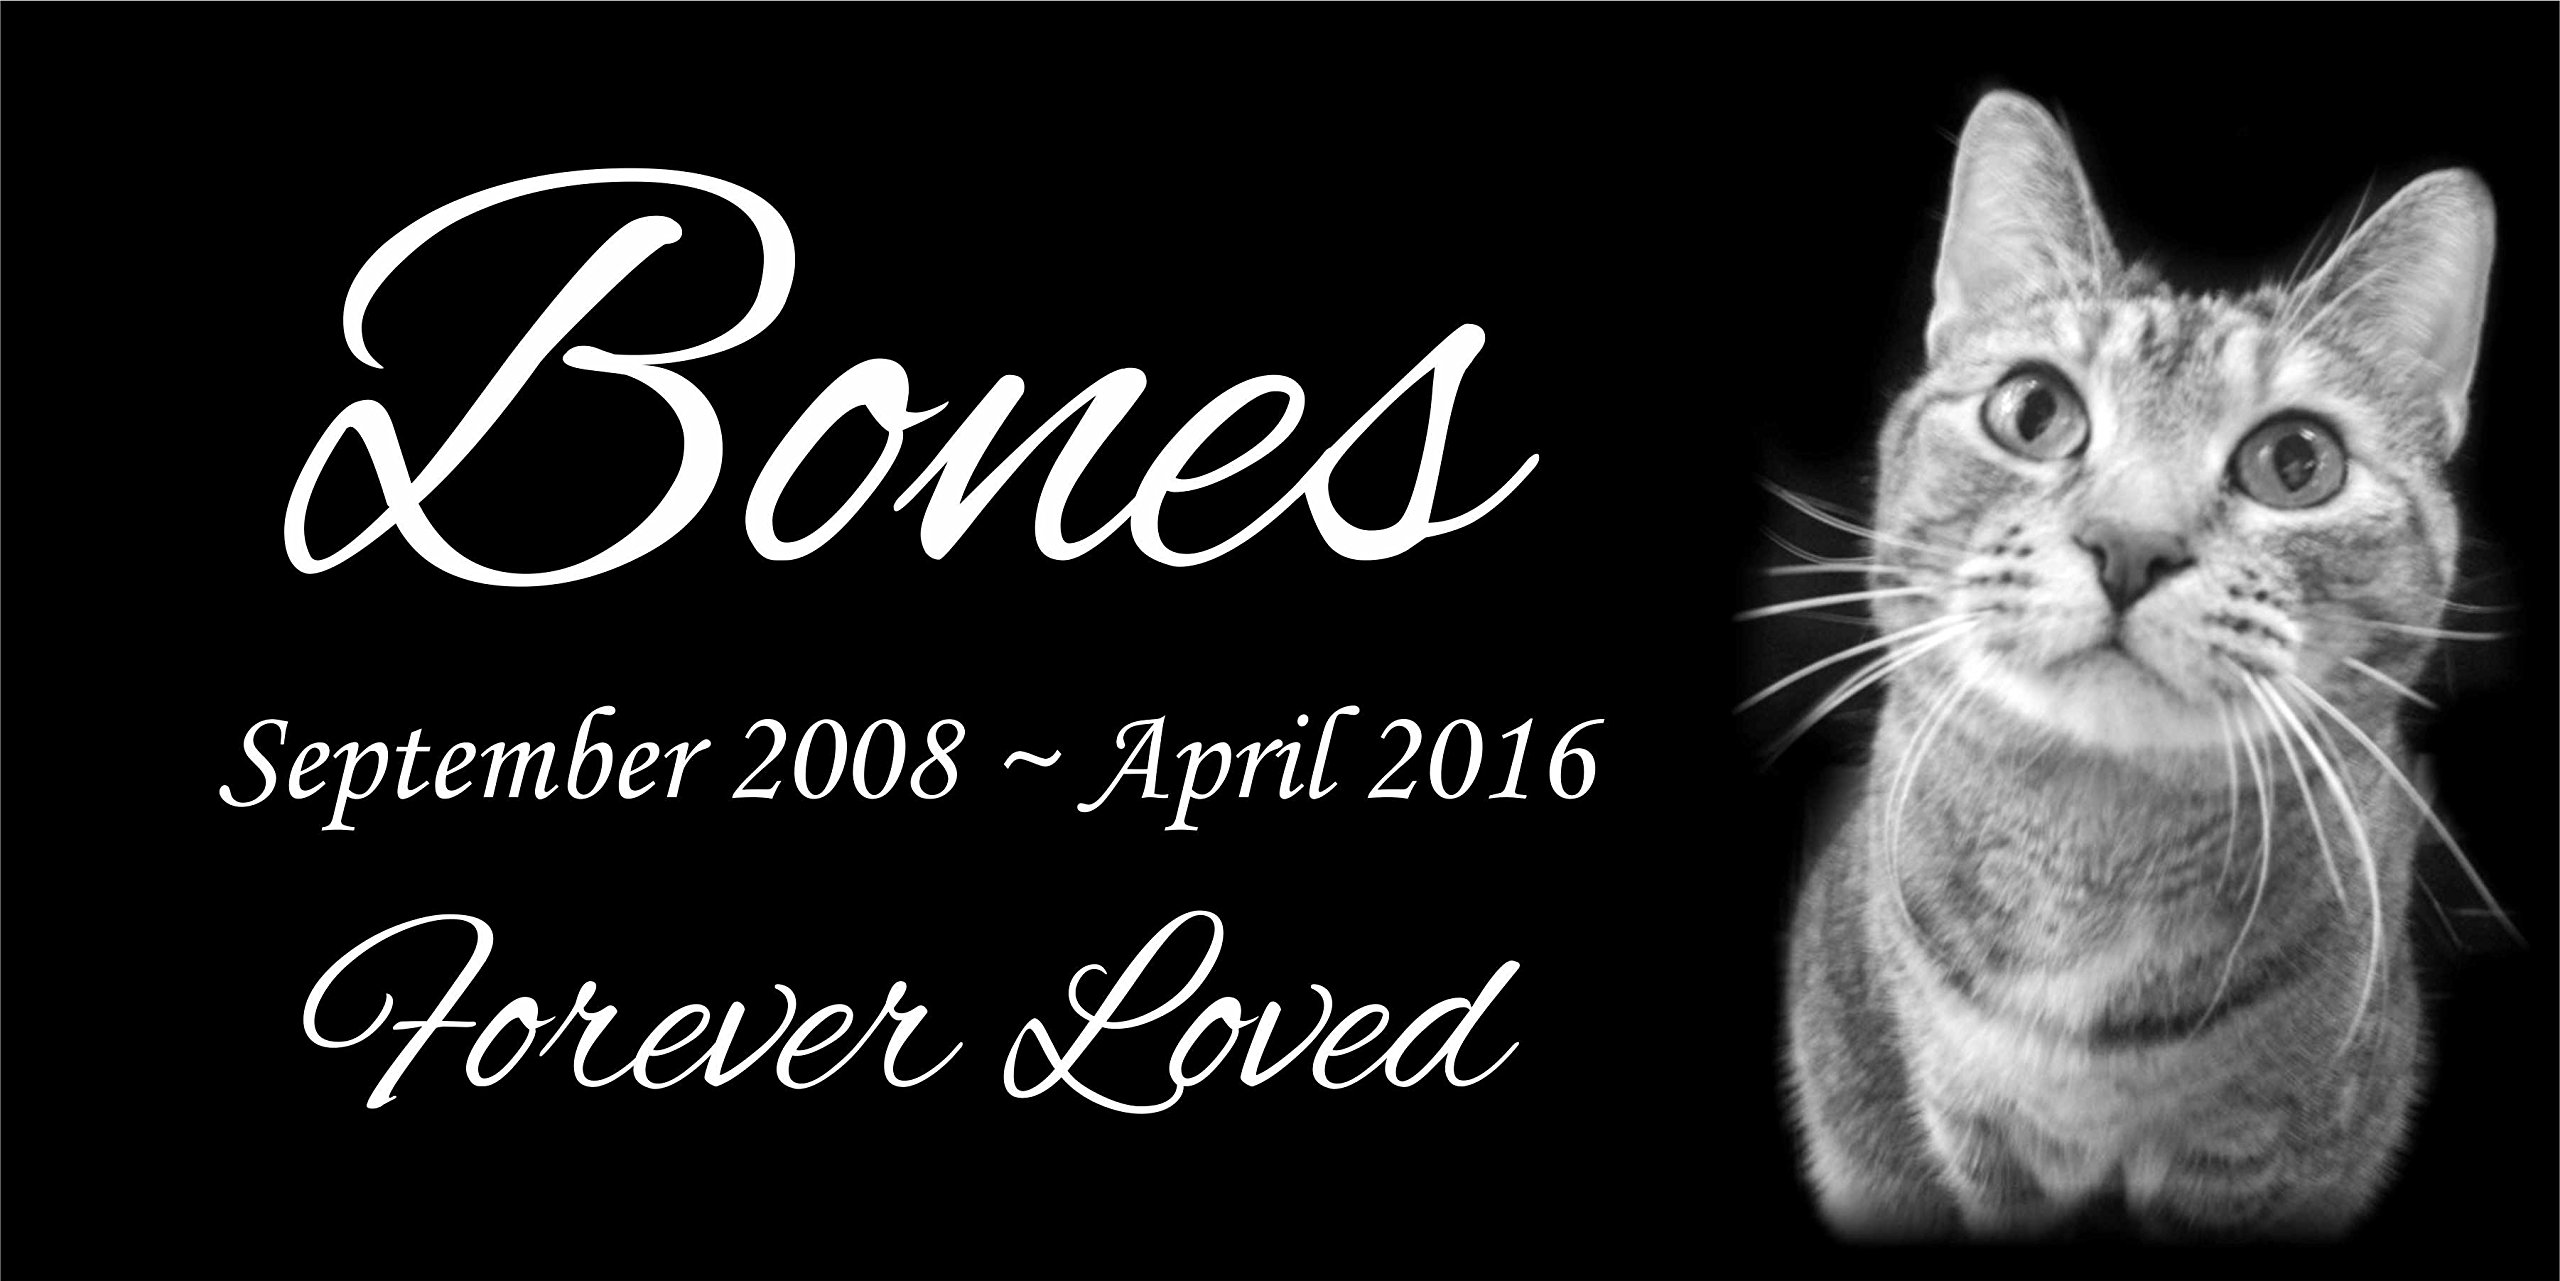 Personalised Pet Stone Memorial Marker Granite Marker Dog Cat Horse Bird Human 6'' X 12'' Kitten